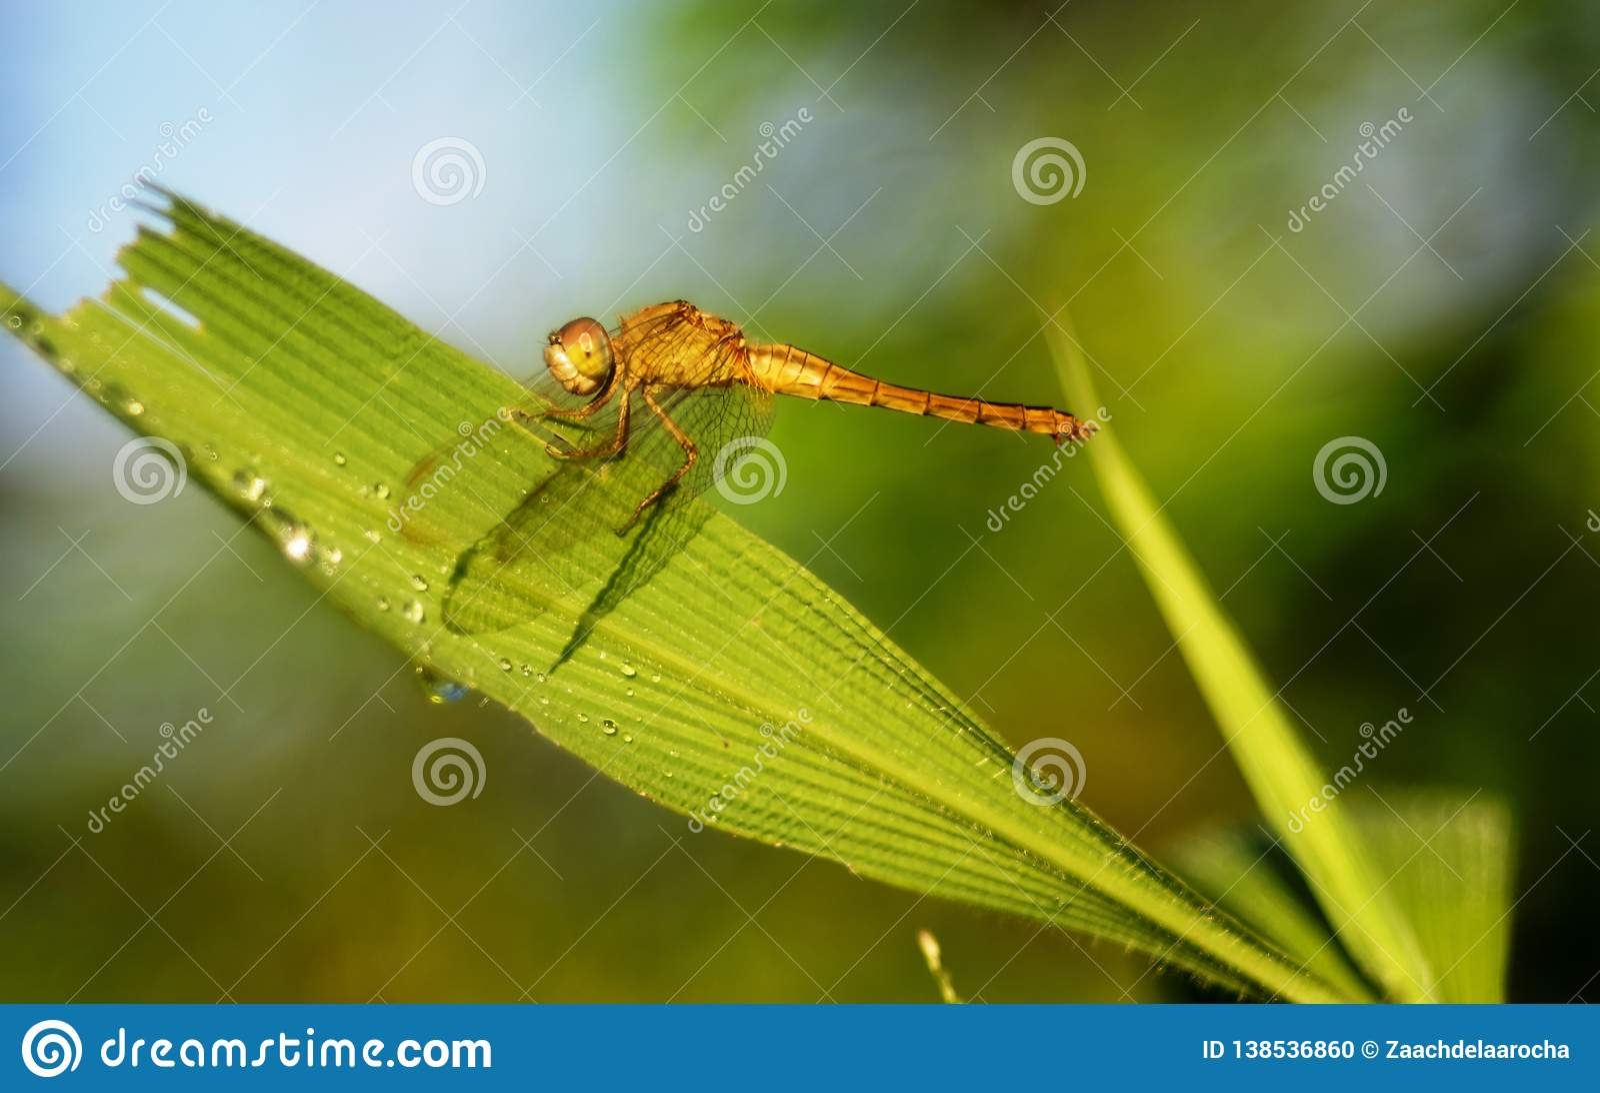 En gul slända, daggdroppar, grönt gräs